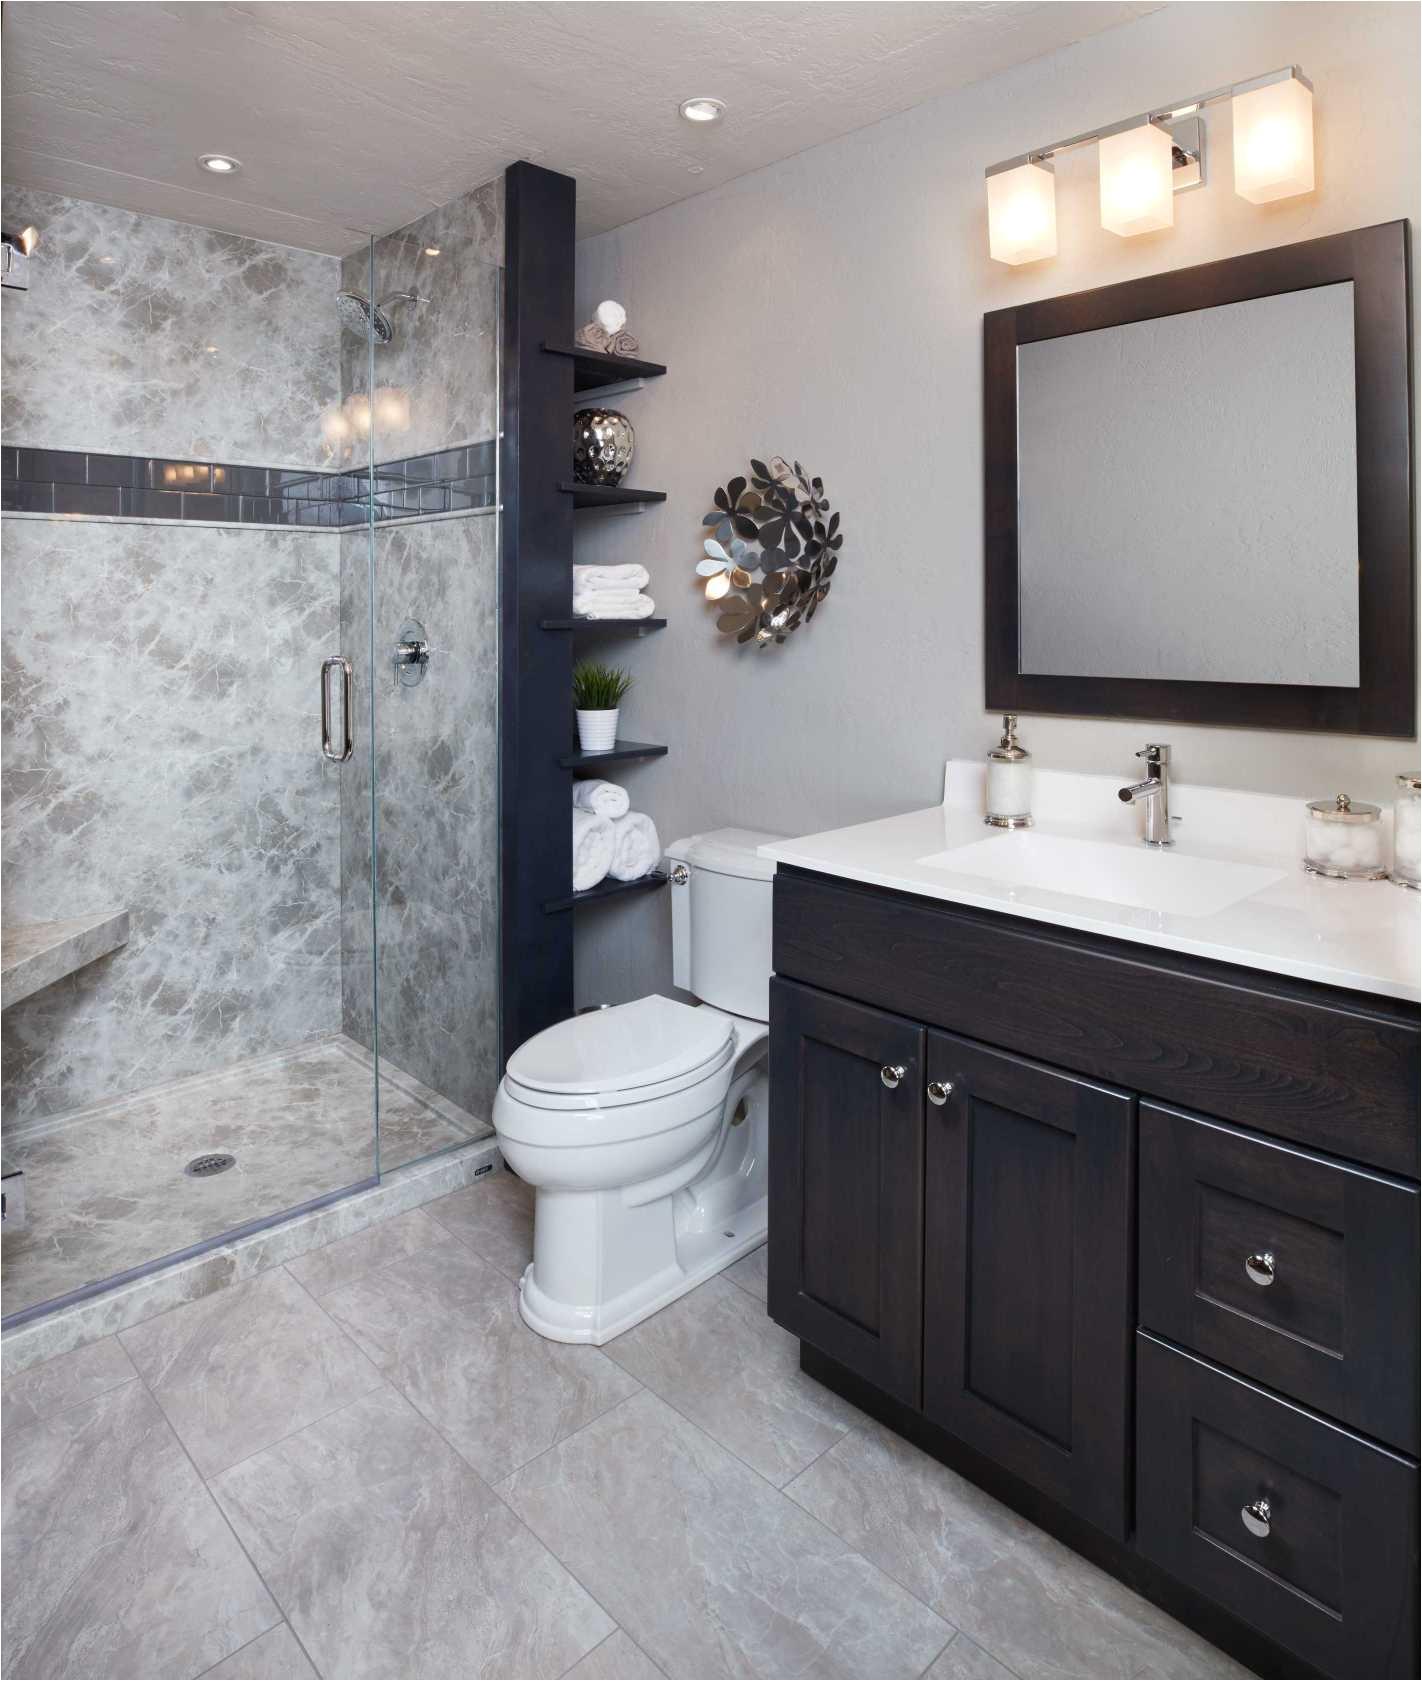 bathtub overlay awesome bathroom bathfitters prices bathtub liners lowes best bathtub refinishing atlanta